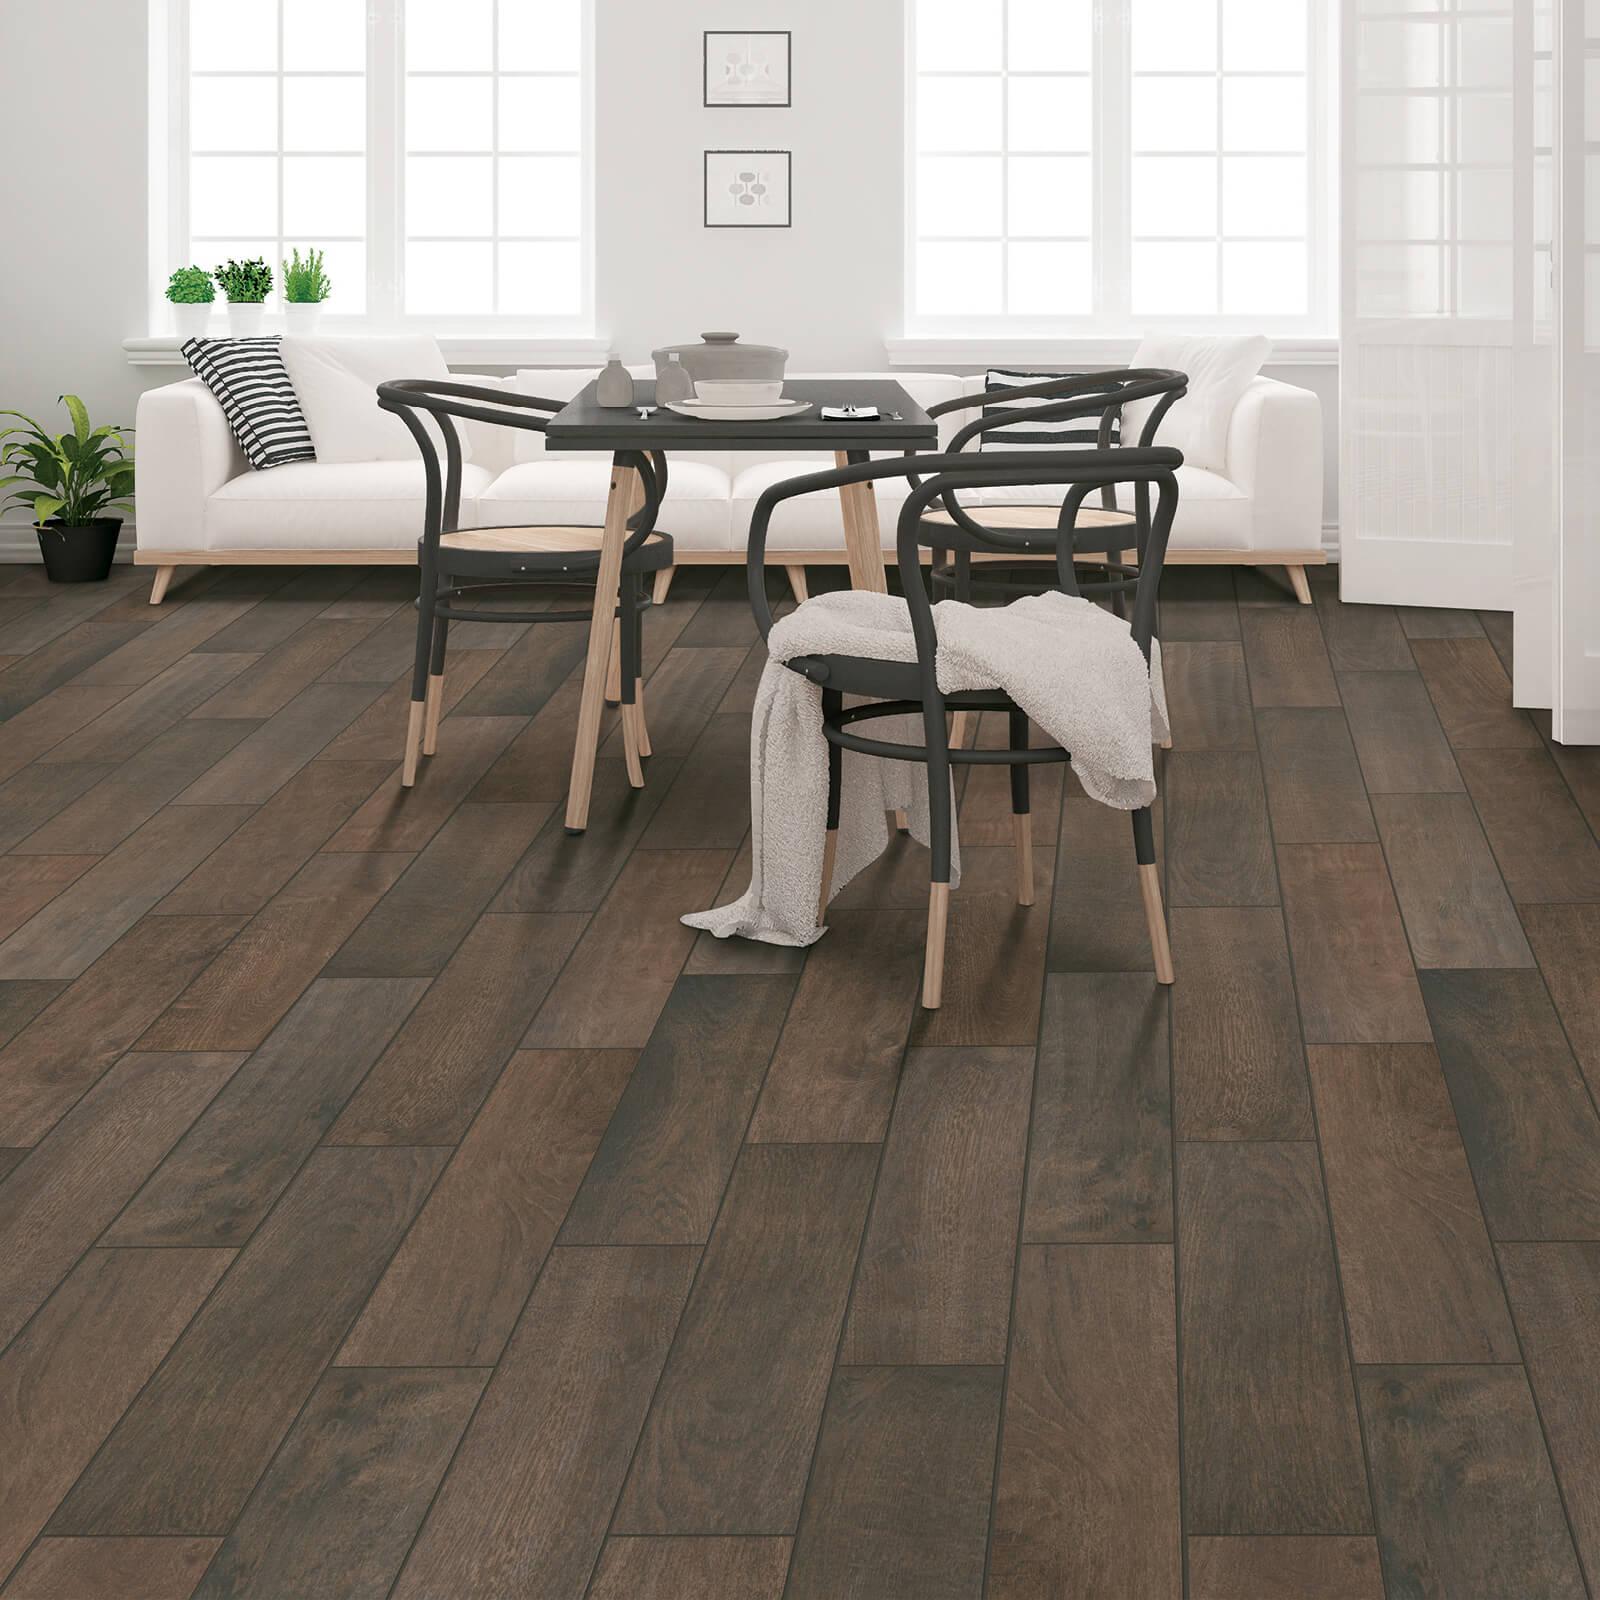 Hall Tiles | McSwain Carpet & Floors